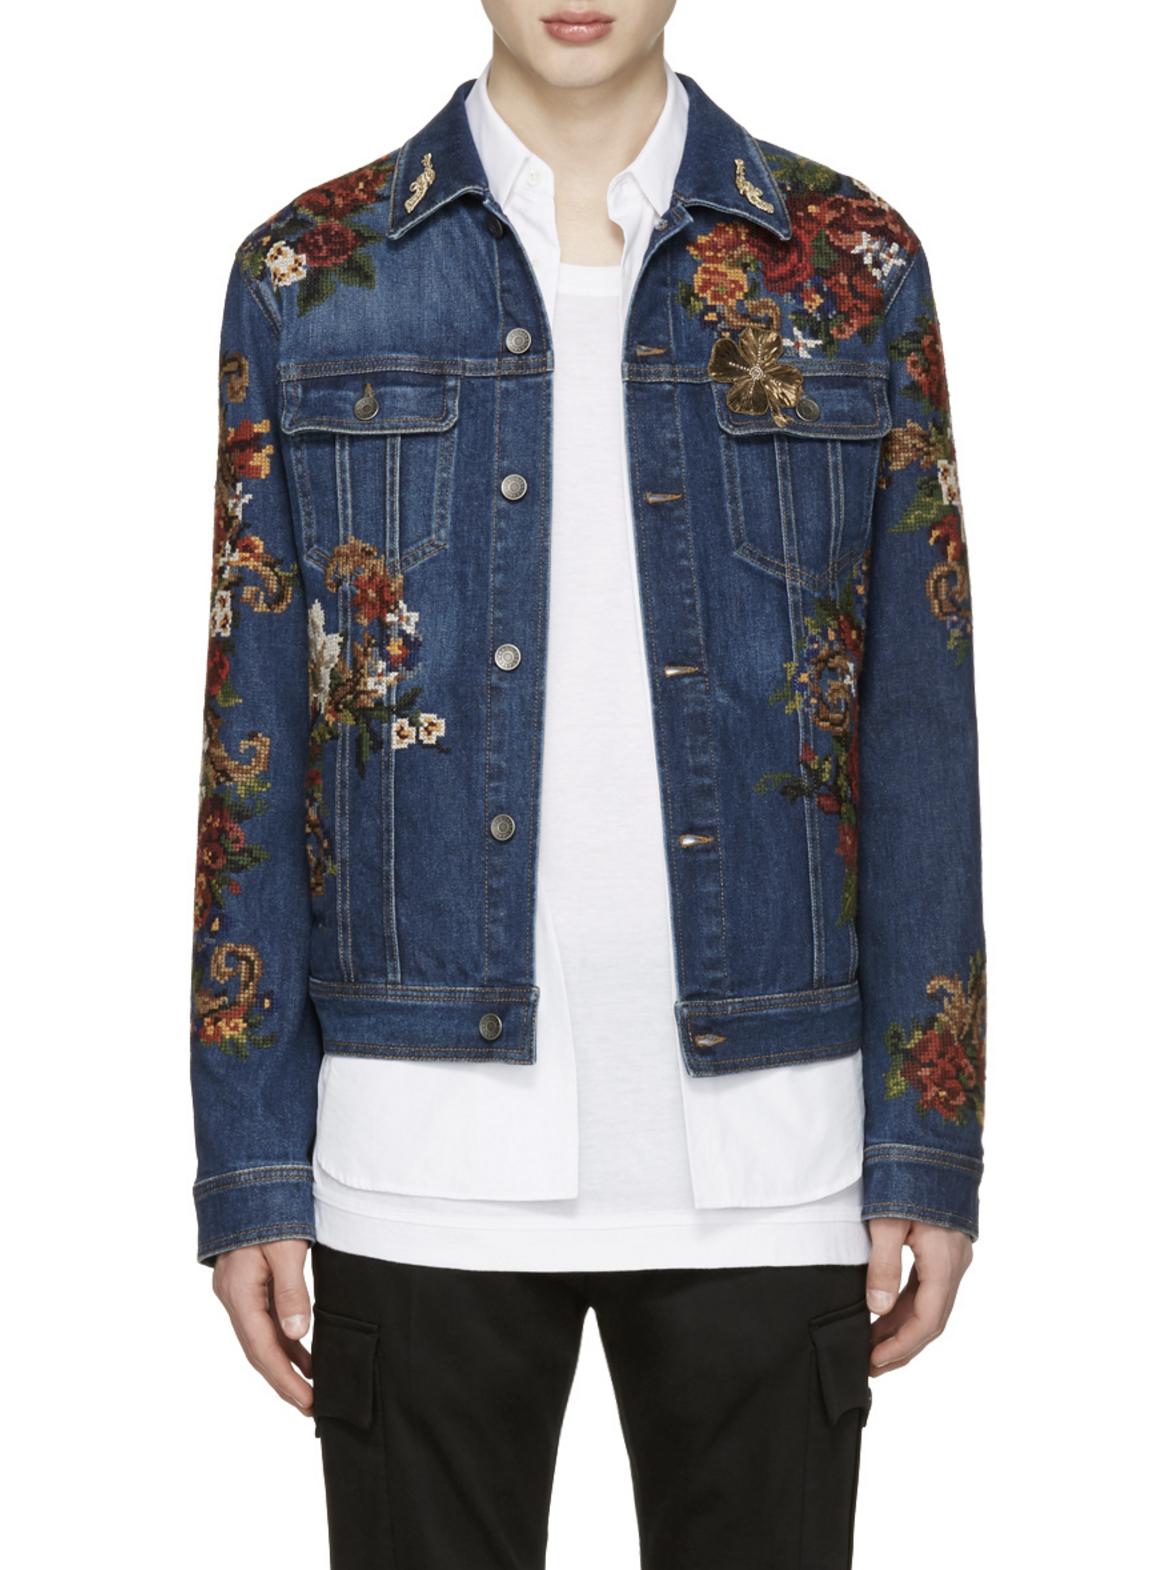 8cfb3138a6 Dolce   Gabbana embroidered denim jacket from SSENSE (men